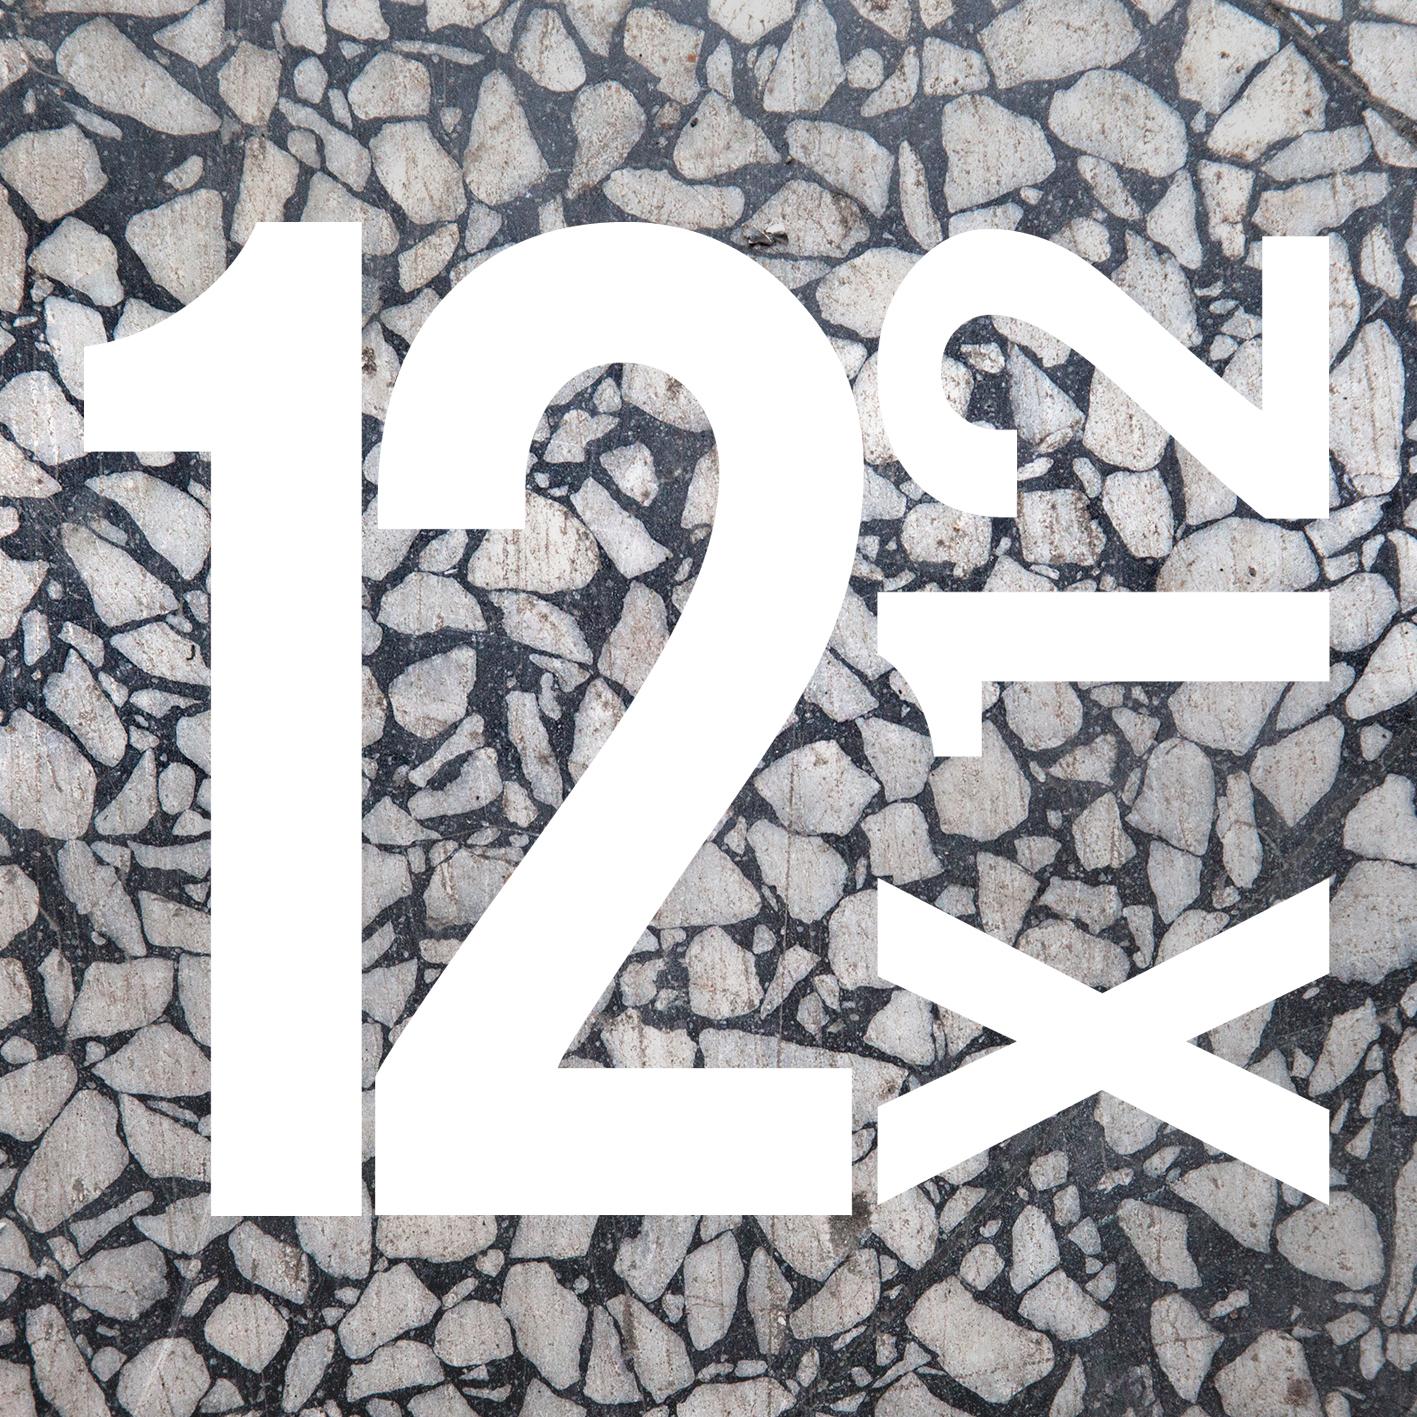 - To celebrate a wonderful 3 years at The Stockroom and the launch of our new gallery in Clifton Hill we have decided to throw one of the BIGGEST groups shows we have ever curated. Featuring over 200 artists working on a 12x12 canvas the show includes a wonderful line-up of local talent alongside an exciting range of internationals! Artists featured include...23rd Key - 2choey - Abyss 607 - Adam Fujita - Adam Kinninmont - Alex Lehours - Alex Louisa - Alison Turnbull - AM DeBrincat - Amy Howard - Anna Seed - Apeseven - ARGH - Barek - Beccy Brown - Ben Frost - Bonnie Eichelberger - Brian Cheung - Butch Anthony - CAMO - Caper - Carmen Hui - Caro Pepe - Casey Freeman - Chase Archer - Chehehe - Chloe Wilder - Chris Costa - Christian Böhmer - Clare Brady - Coco Meecham - Collin van der Sluijs - CreatureCreature - David Houghton - DNART - Dosey - Dvate - Dzia - Ekiem - Elena Pancorbo - Emma 'Ruby' Armstrong-Porter - Emma Hampton - Emma Morgan - Emma Mount - Emmanuel Moore - Erin Smith - Faunagraphic - Fergie - Freya Jobbins - Fudge Works - Gary Seaman - Gemma Stylz - Gigi Gordes - Glen Downey - Hanna Mancini - Hayden Dewar - Hayely Welsh - Helen Proctor - Hnrx - Houl - Hugo Mathias - Inari - Isolde - Jack Douglas - Jack Franceschini - Jae Copp - James Giddy - James Wilson - Jana & Js - Jane Guthleben - Jason Eatherly - Jason Parker - Jennifer Allnutt - Jeremy Austin - Jeremy Piert - Jess Southey - Jessica Hess - Joe Stafford - Johanna Wilbraham - John Curtis - Jordan Debney - Joseph Renda Jr - Kaitlin Beckett - Kareena Zerefos - Karen Farmer - Kat Weir - Kat Young - Katherine Gailer - Katie Gamb - Katie Shriner - Kayla Mahaffey - Keira Hudson - Ken Taylor - Kenz - Kirrily Anderson - Koga One - Krimsone - Krishna Malla - Kuro Neko - Kylie May - Kylie Sirett - Lachlan Hamilton - Ladie Poise - Lauren Guymer - Liam Snootle - Ling - Lisa Dino - Liz Gridley - Logan Moody - Lucks - Lucy Lucy - M. A. RICAFRENTE - Makatron - Malakkai - Man of Darkness - Manda Jean - Marcia King - M